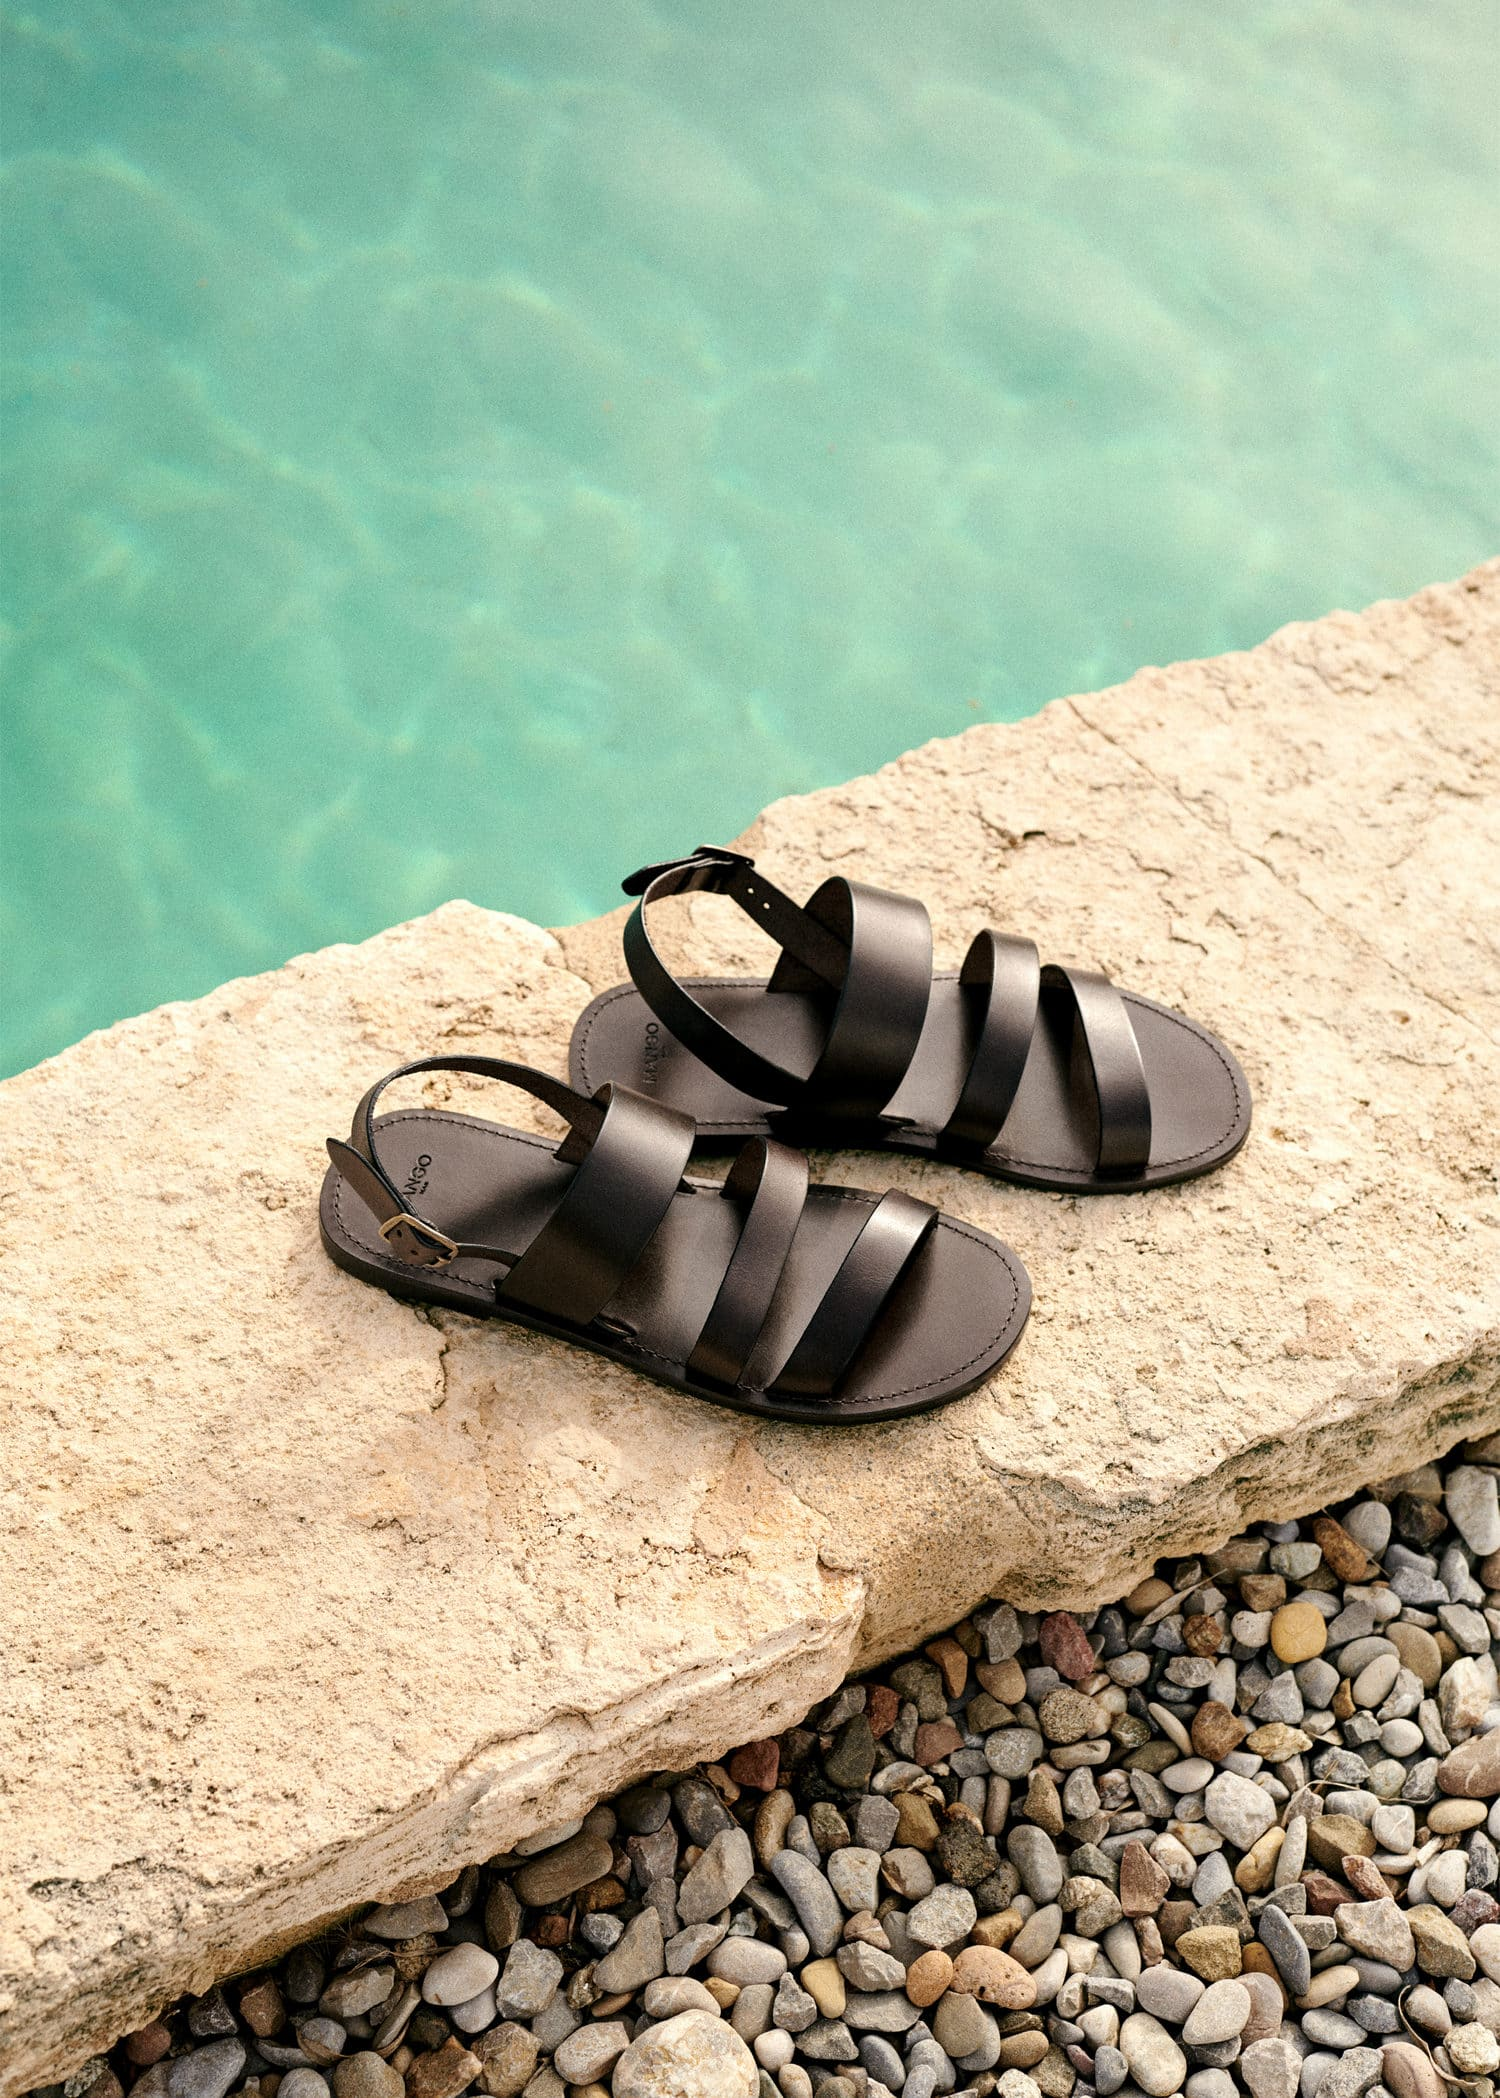 Leather Leather Sandals Leather Gladiator Sandals Sandals Gladiator Gladiator Sandals Leather Gladiator OXkiZPu